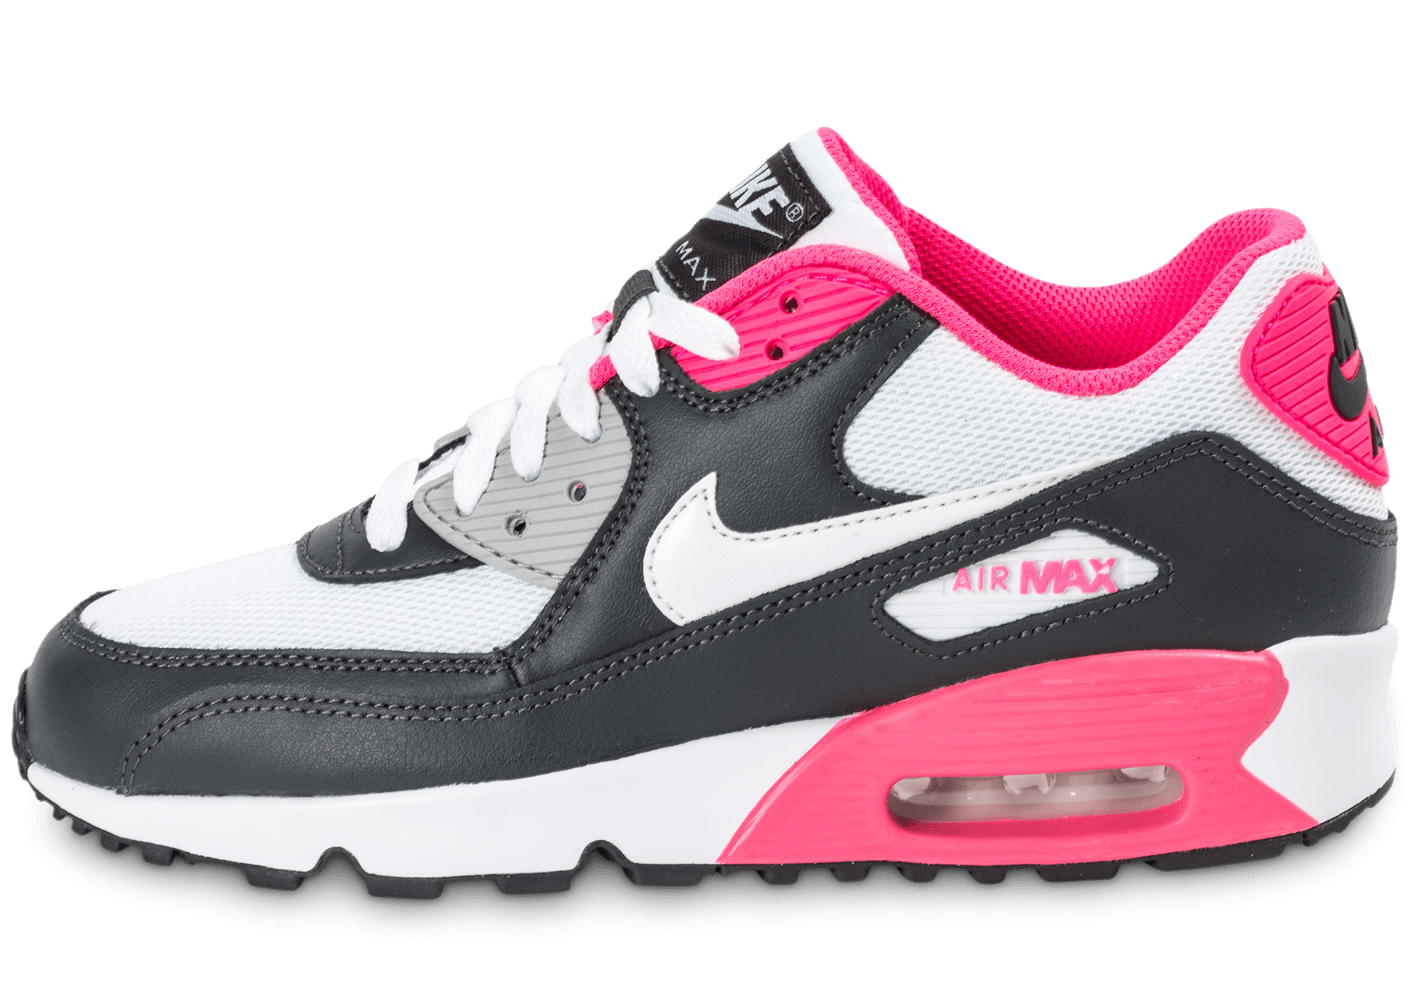 air max rose et noir 2017